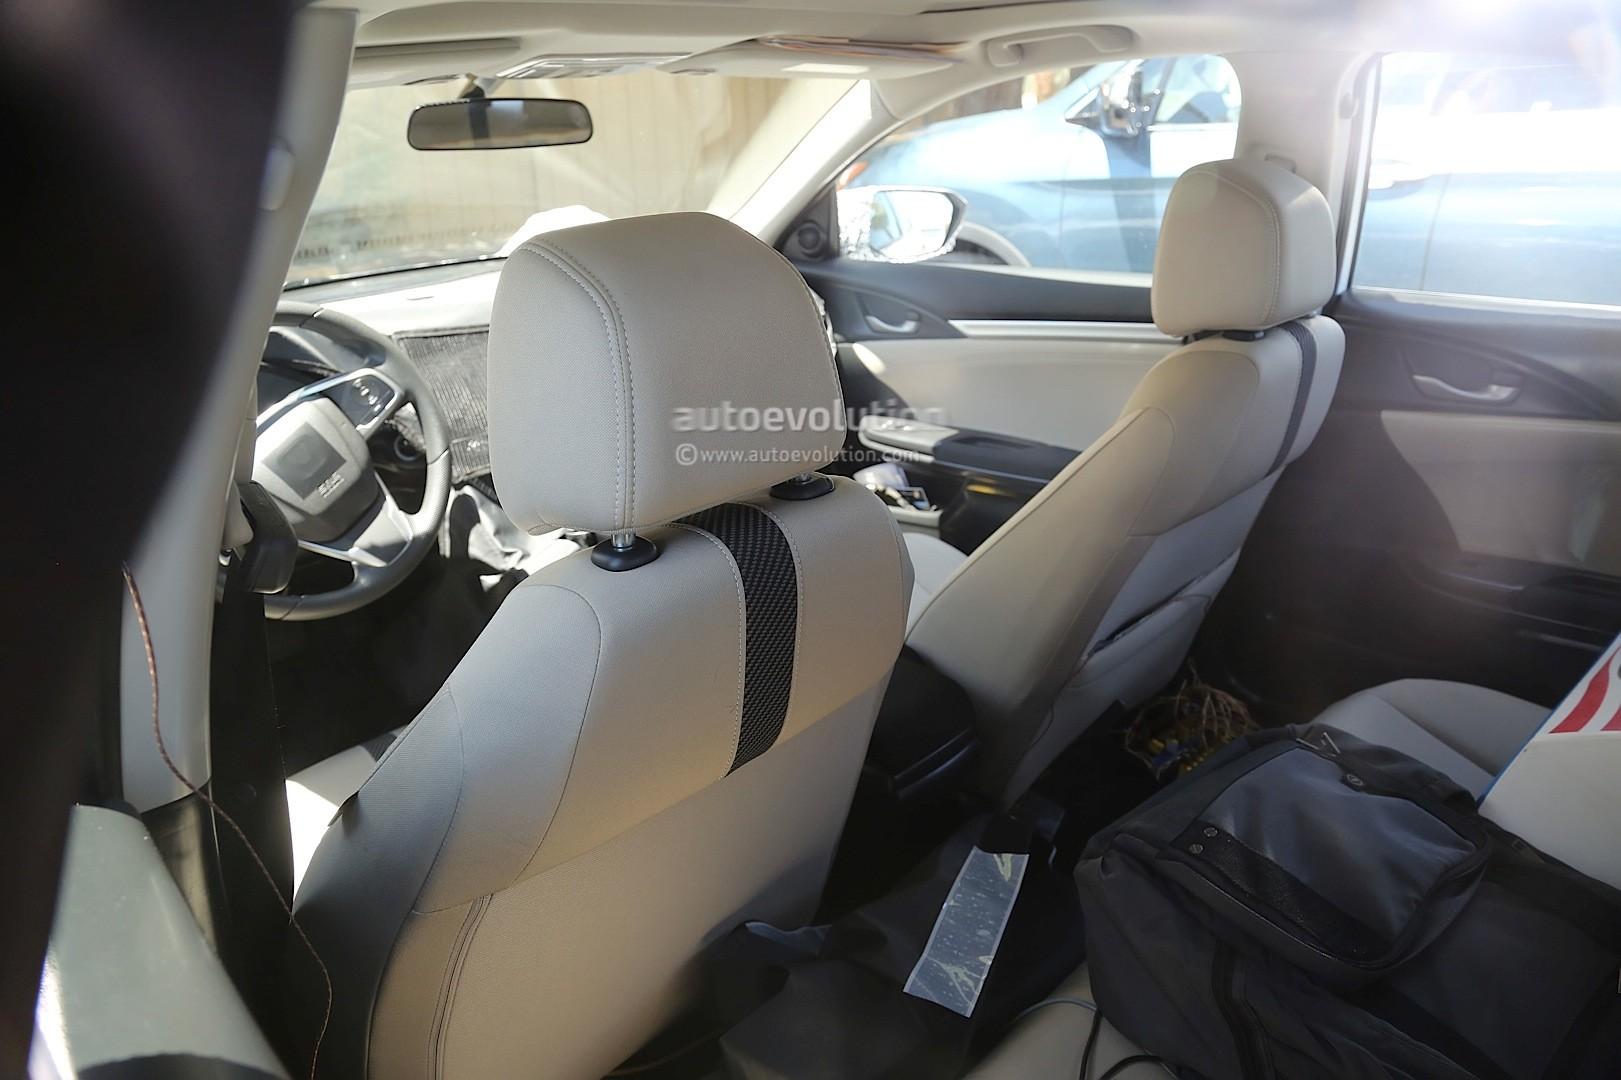 Spyshots: Next-Gen 2017 Honda Civic Sedan Interior Revealed, New ...